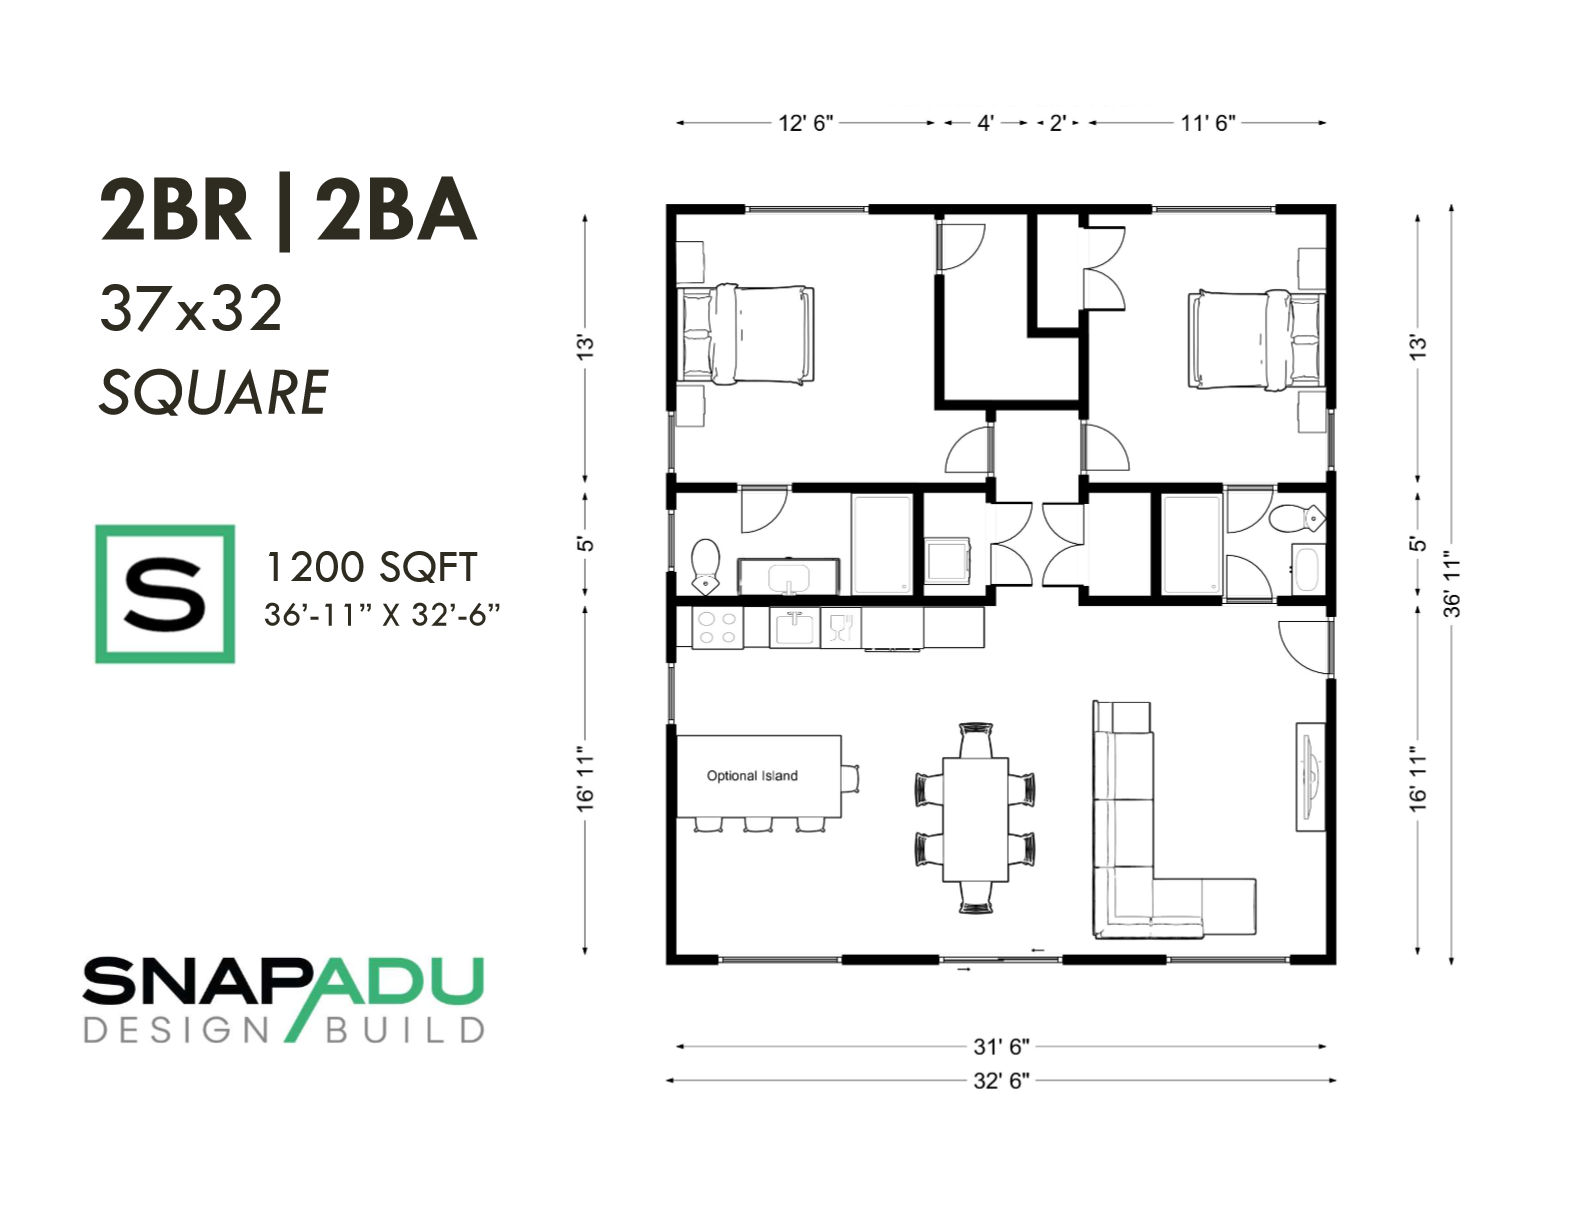 2BR 2BA 1200 sqft 37x32 SQUARE ADU floor plan